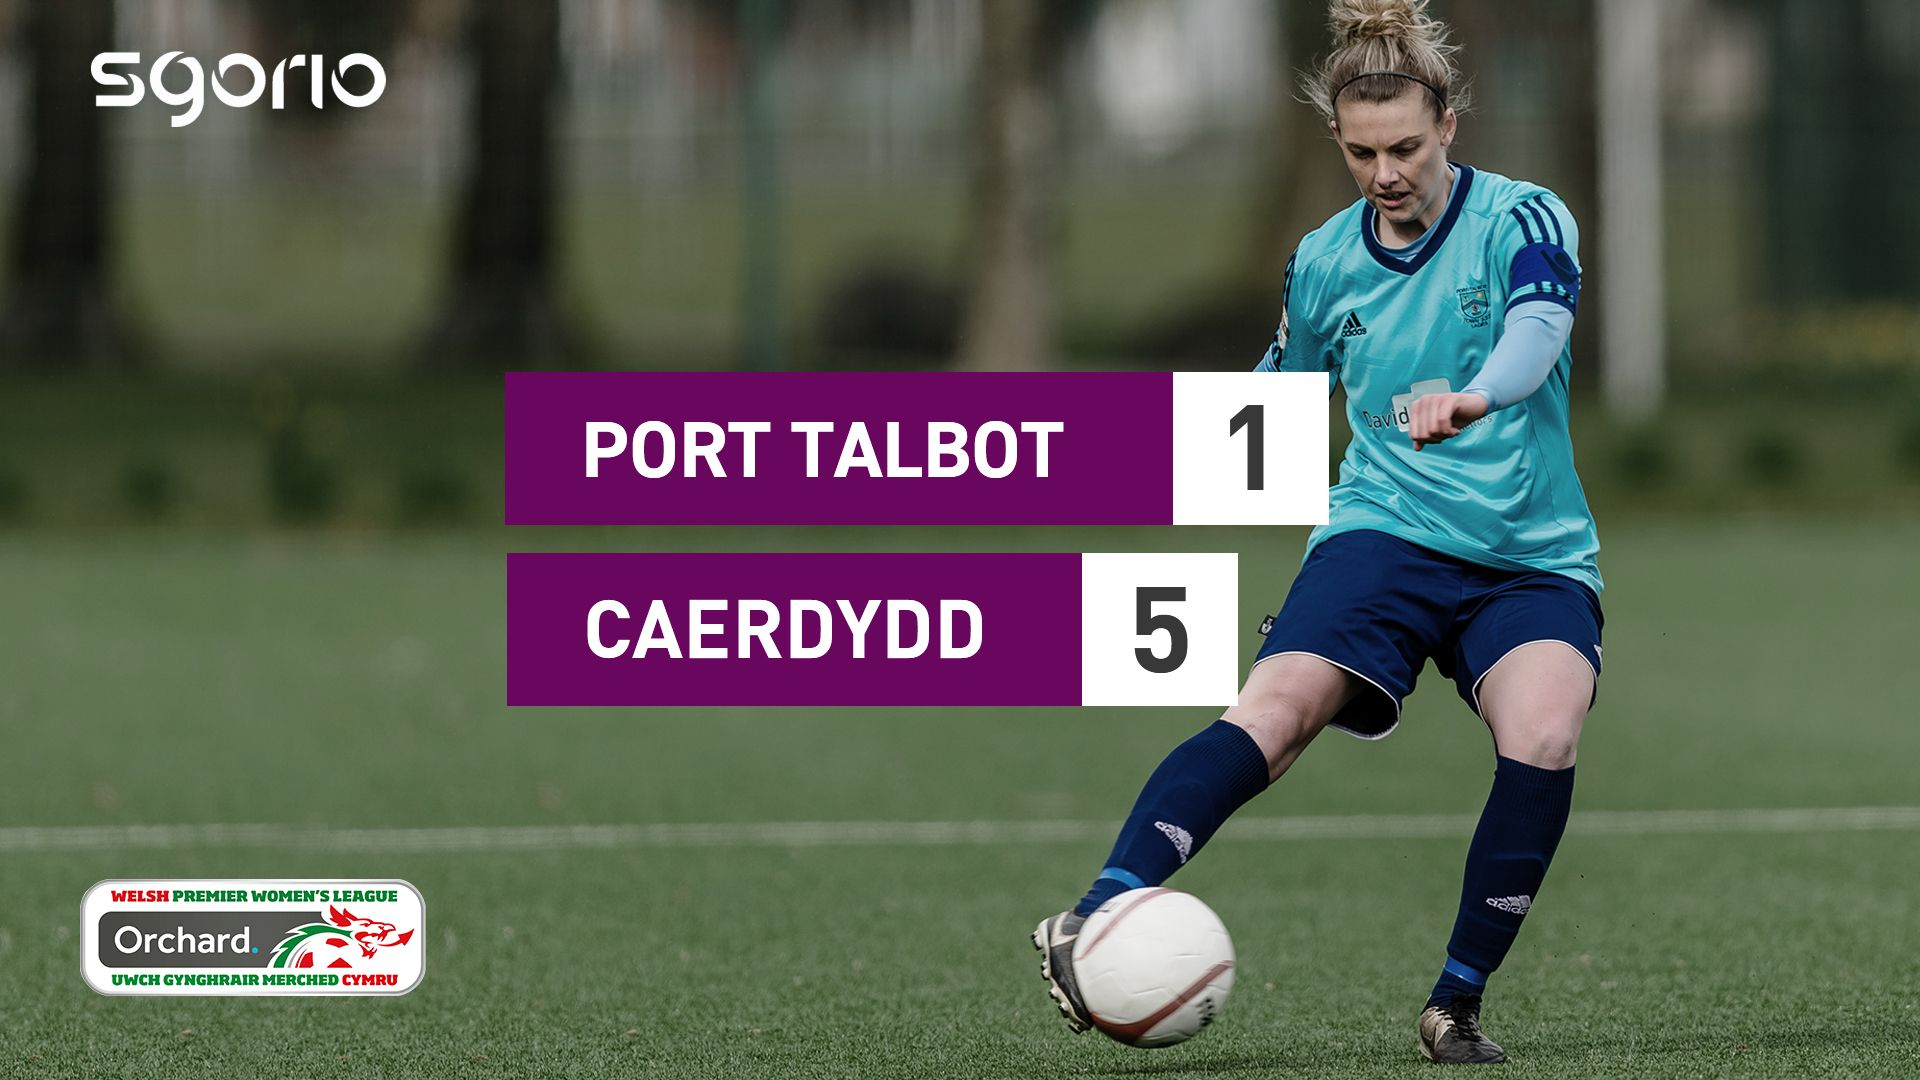 Merched Port Talbot 1-5 Merched Caerdydd